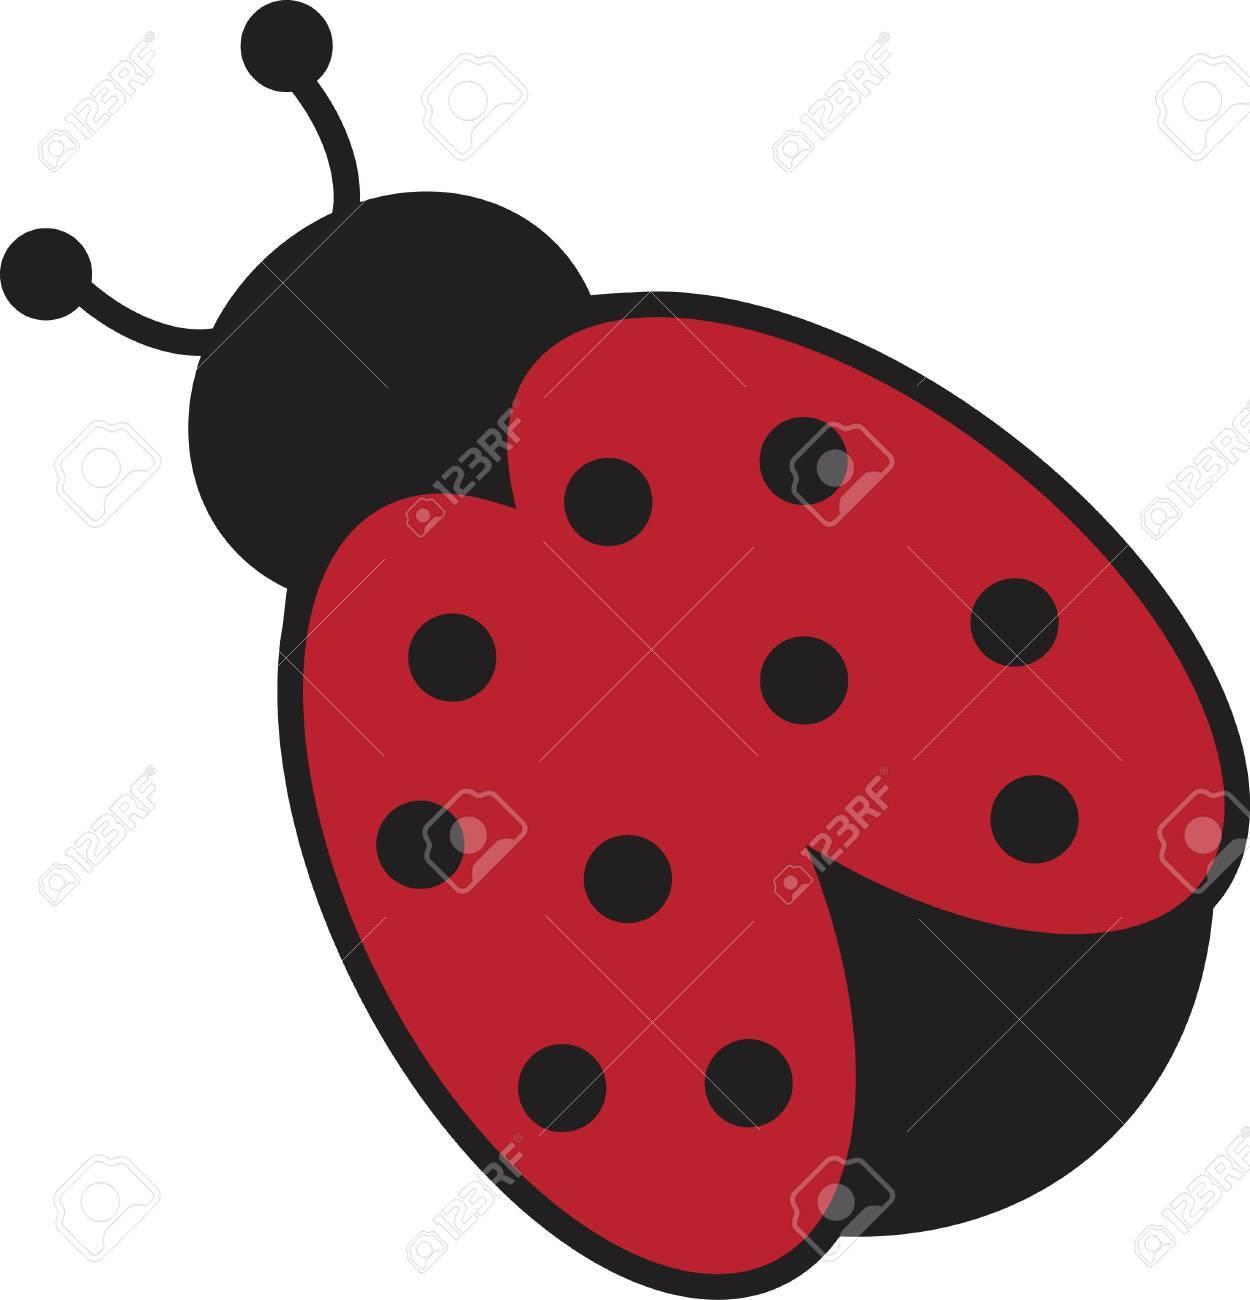 Ladybug - 9190334